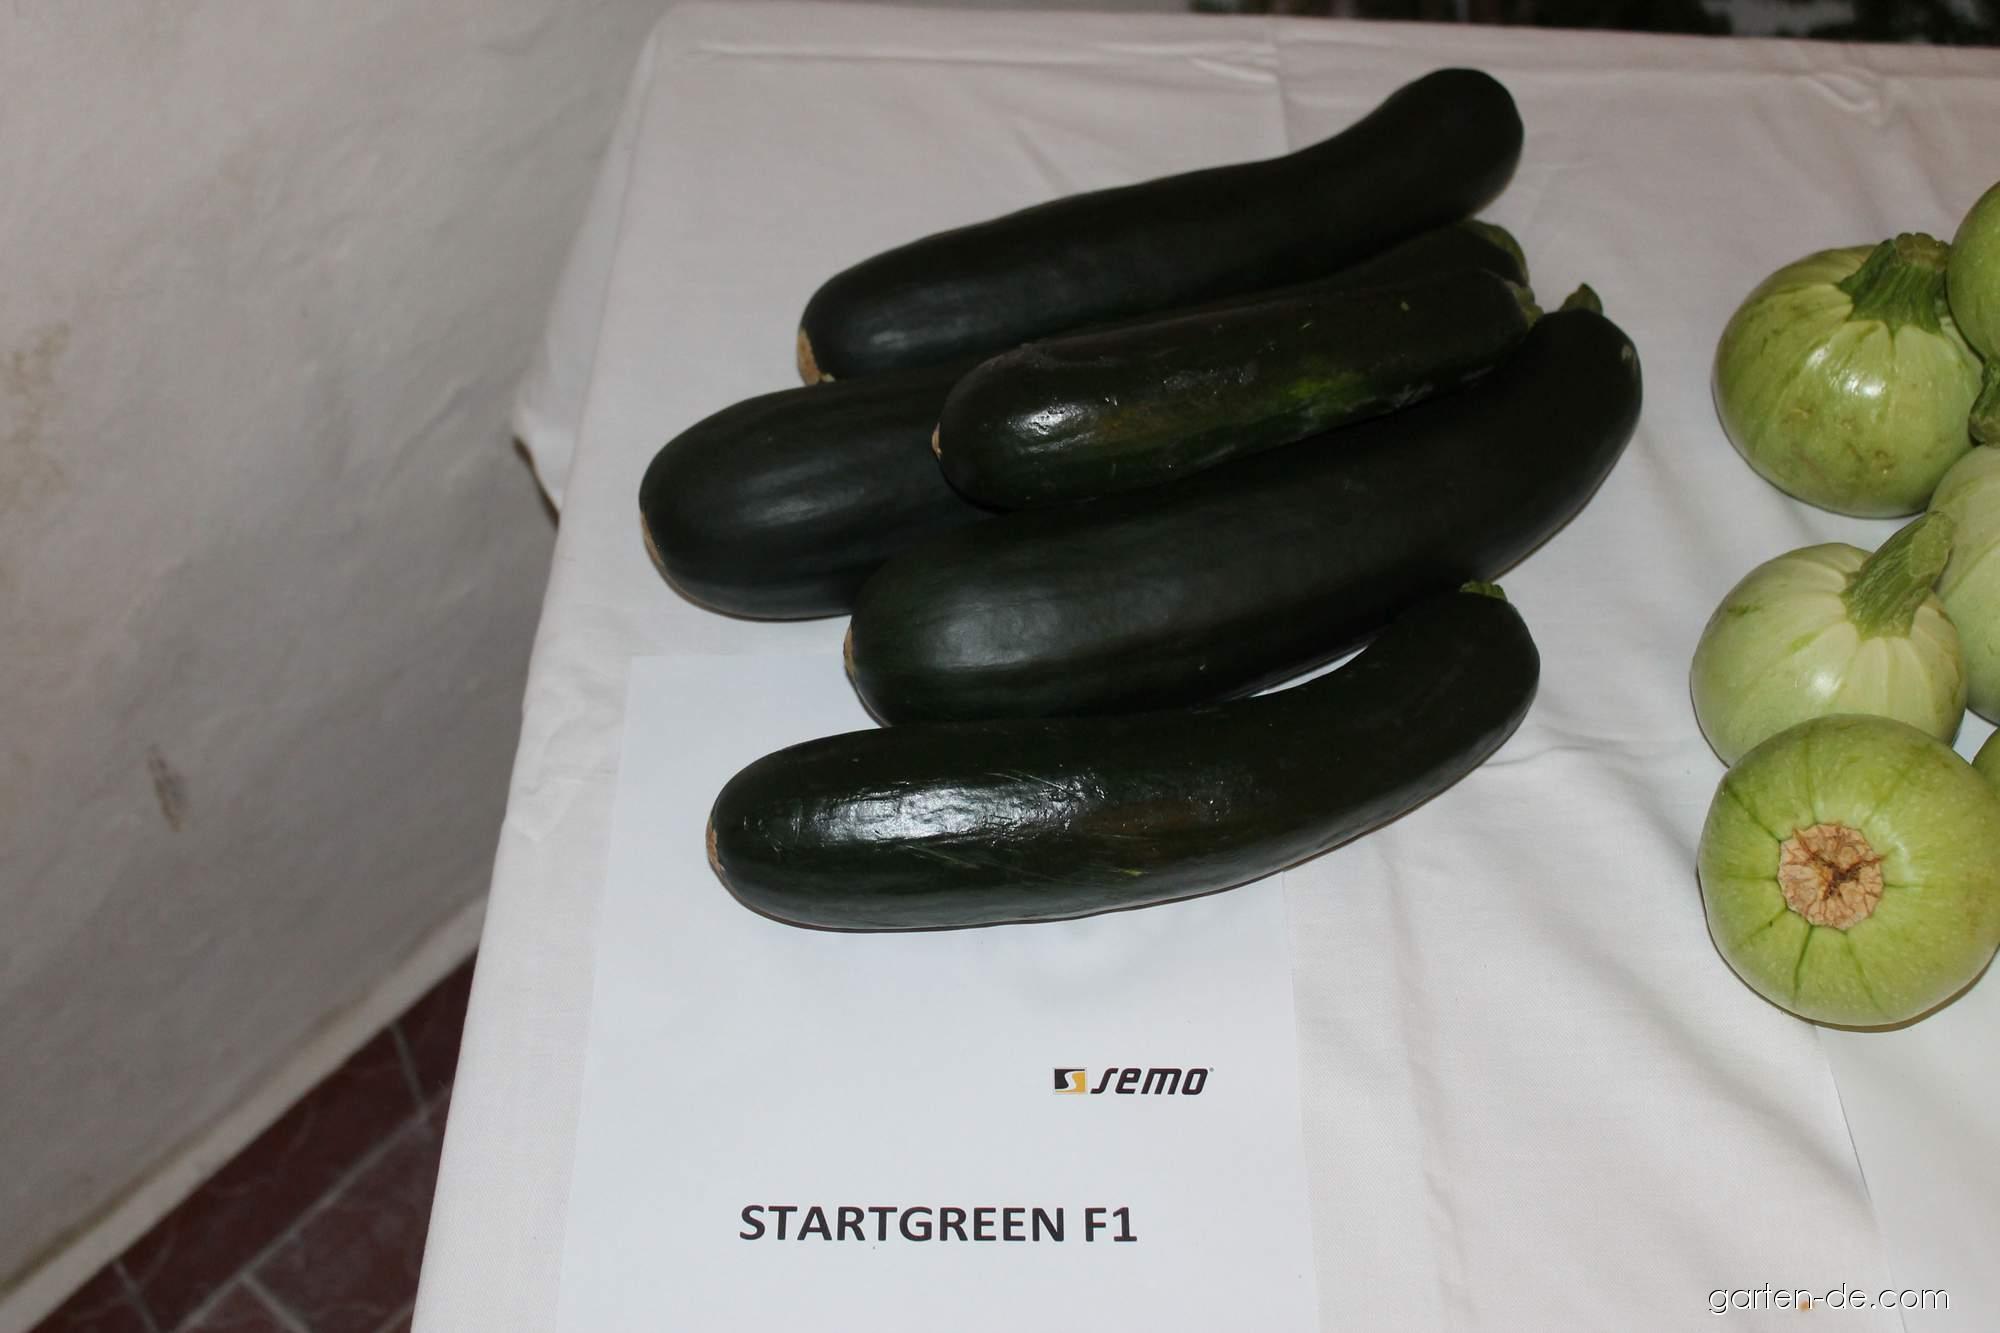 Tykev obecná - cuketa Startgreen (Cucurbita pepo)